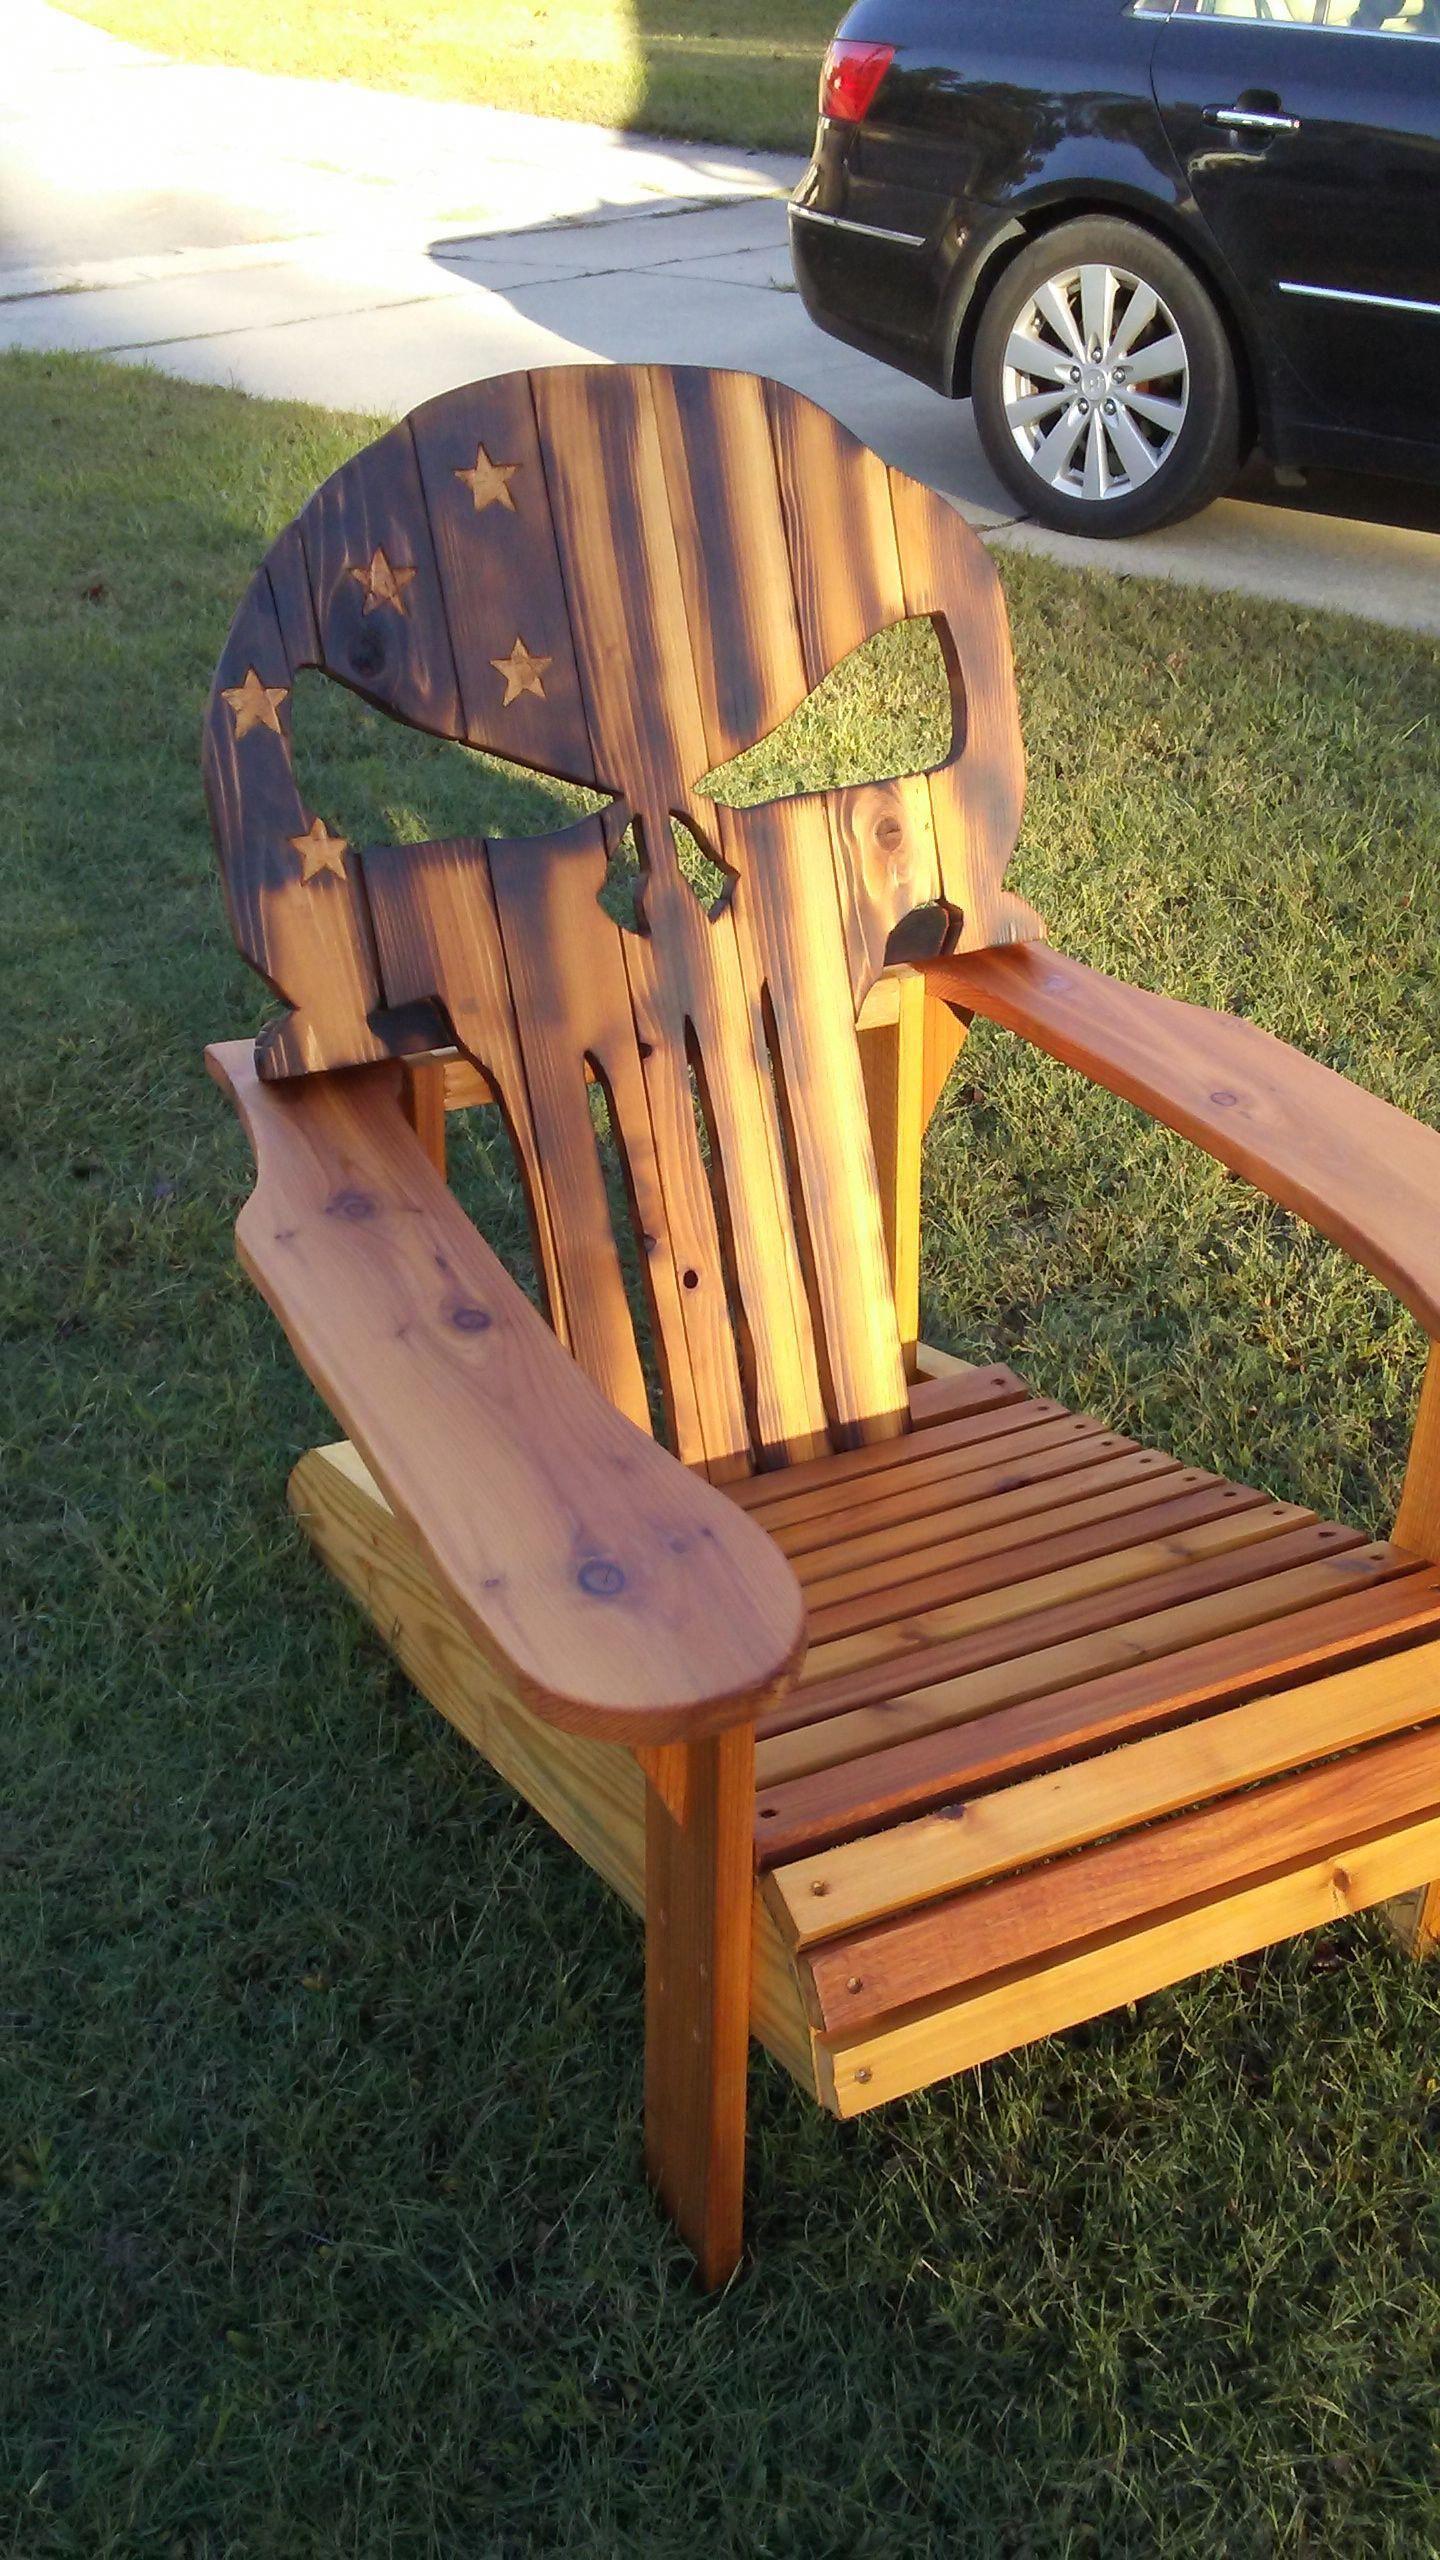 Outdoor Adirondack Chair in Tangerine Orange Finish